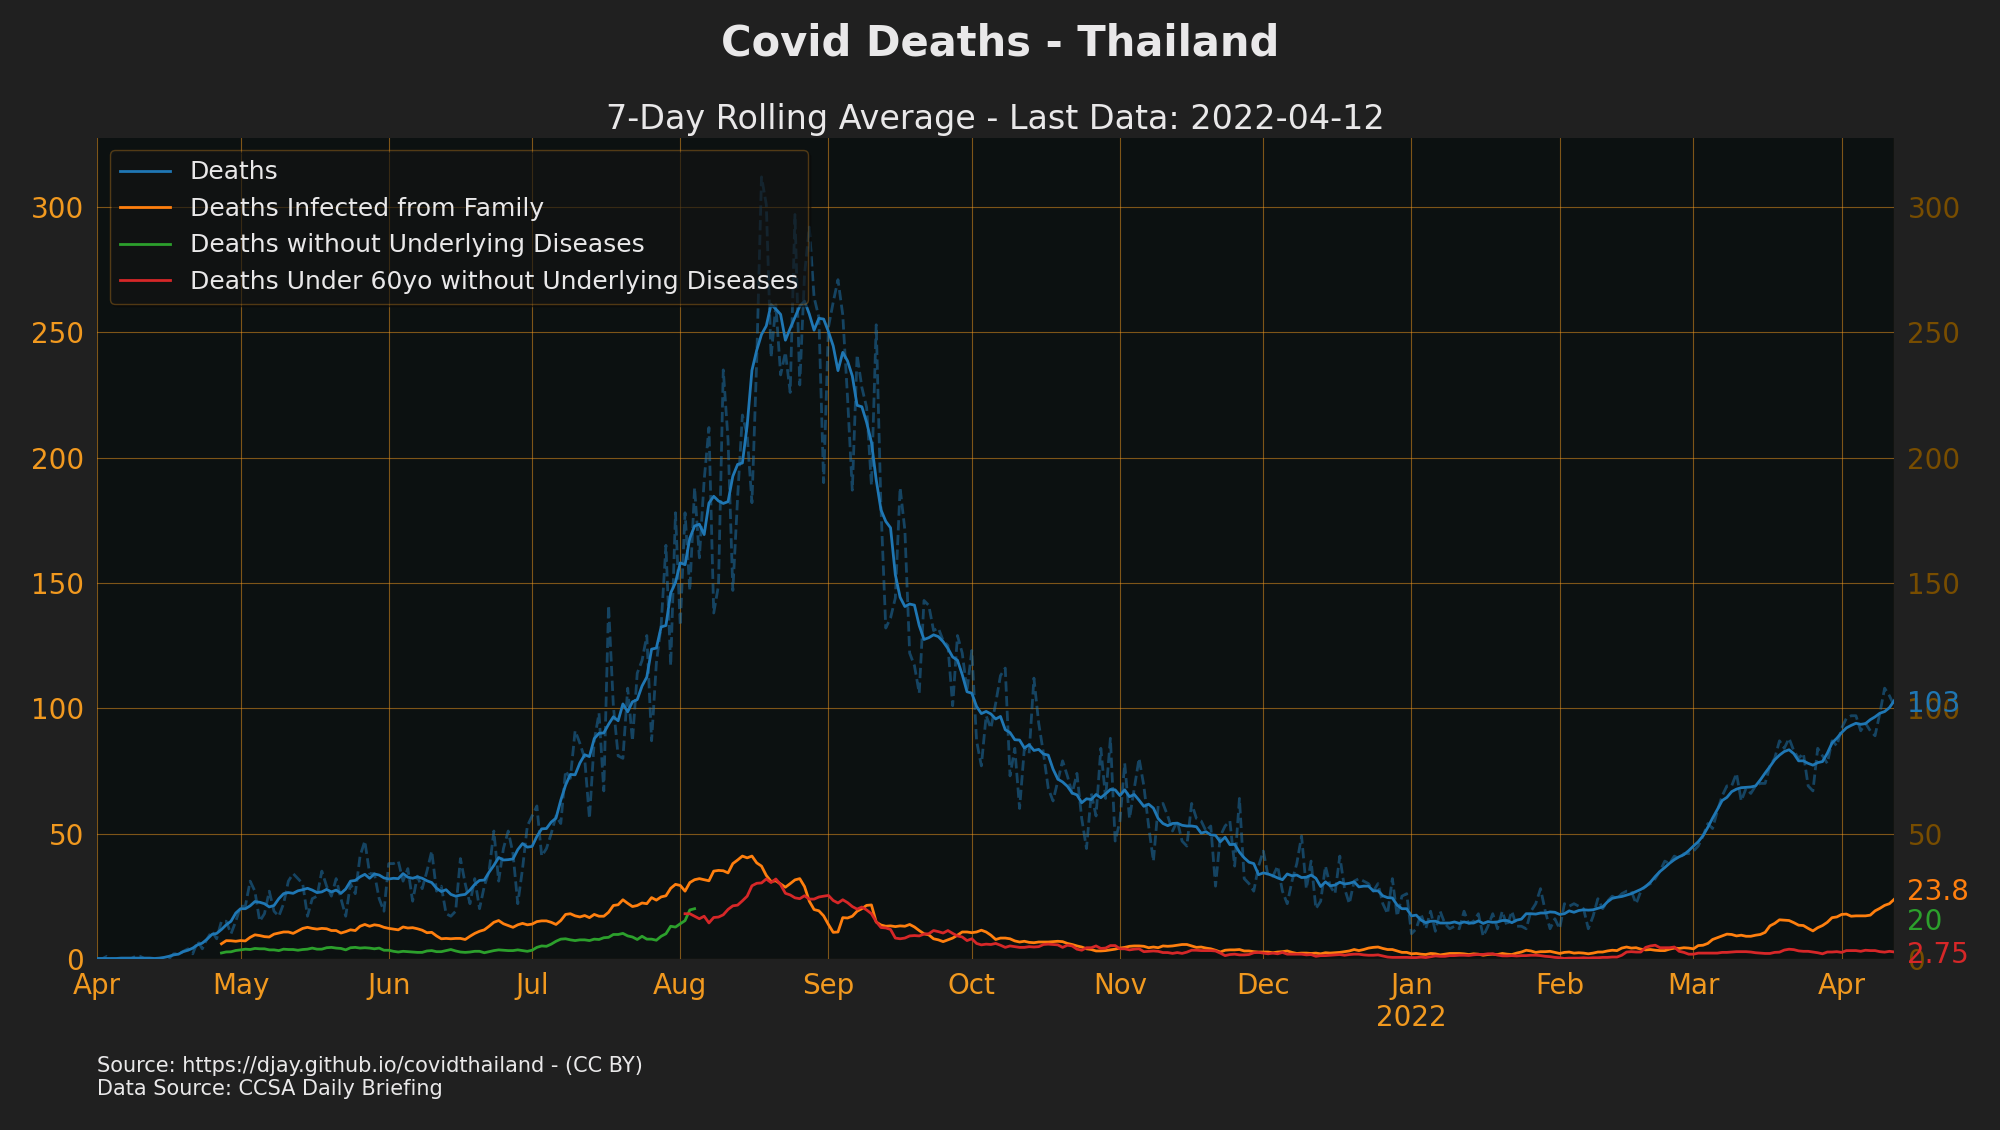 Thailand Covid Deaths by Reason